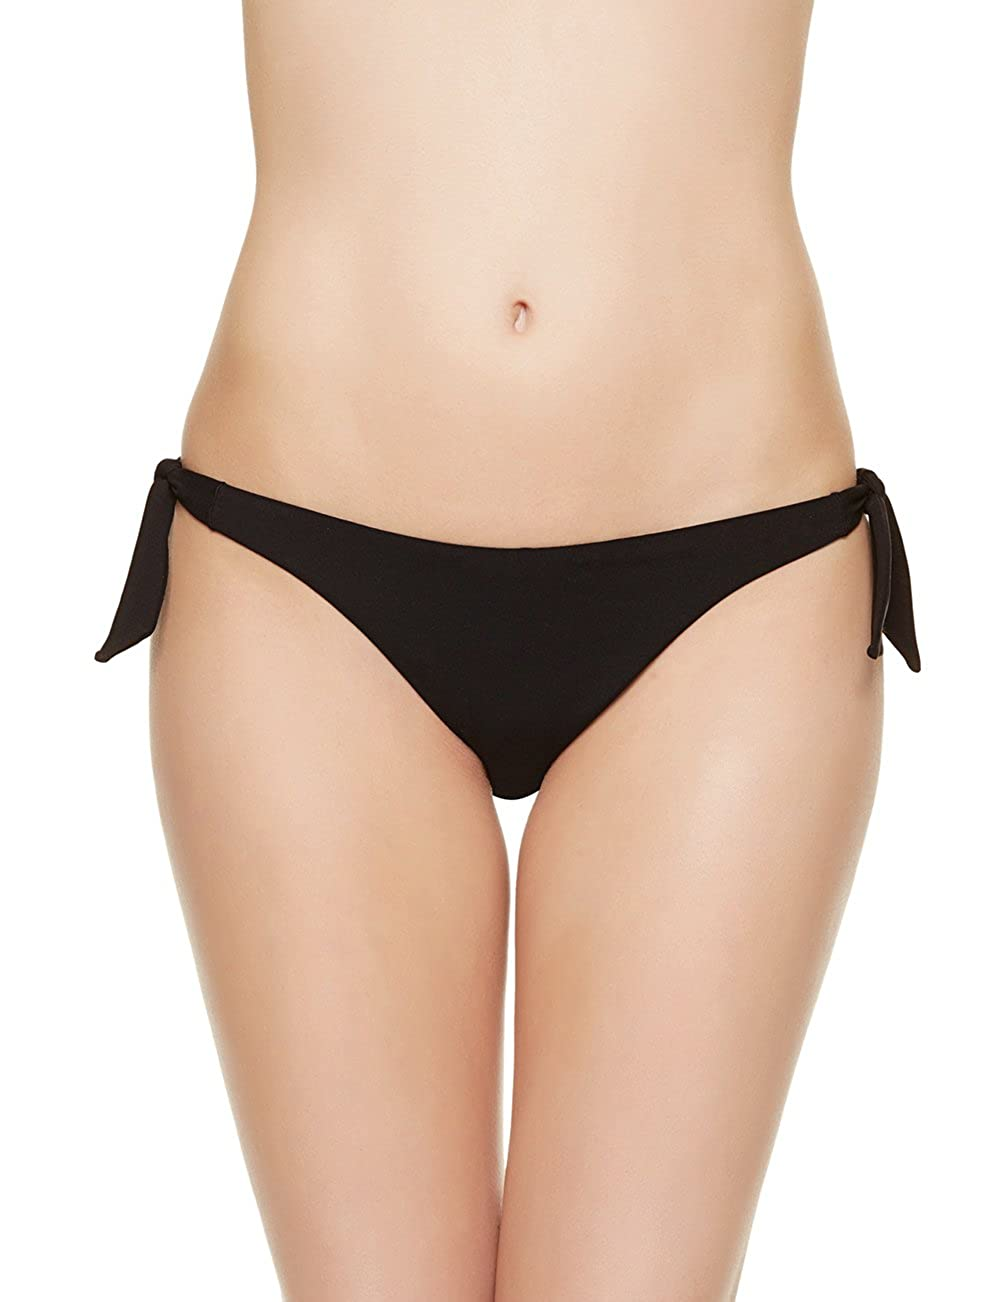 6bb8db43236 Top 10 wholesale Brazilian Panties - Chinabrands.com